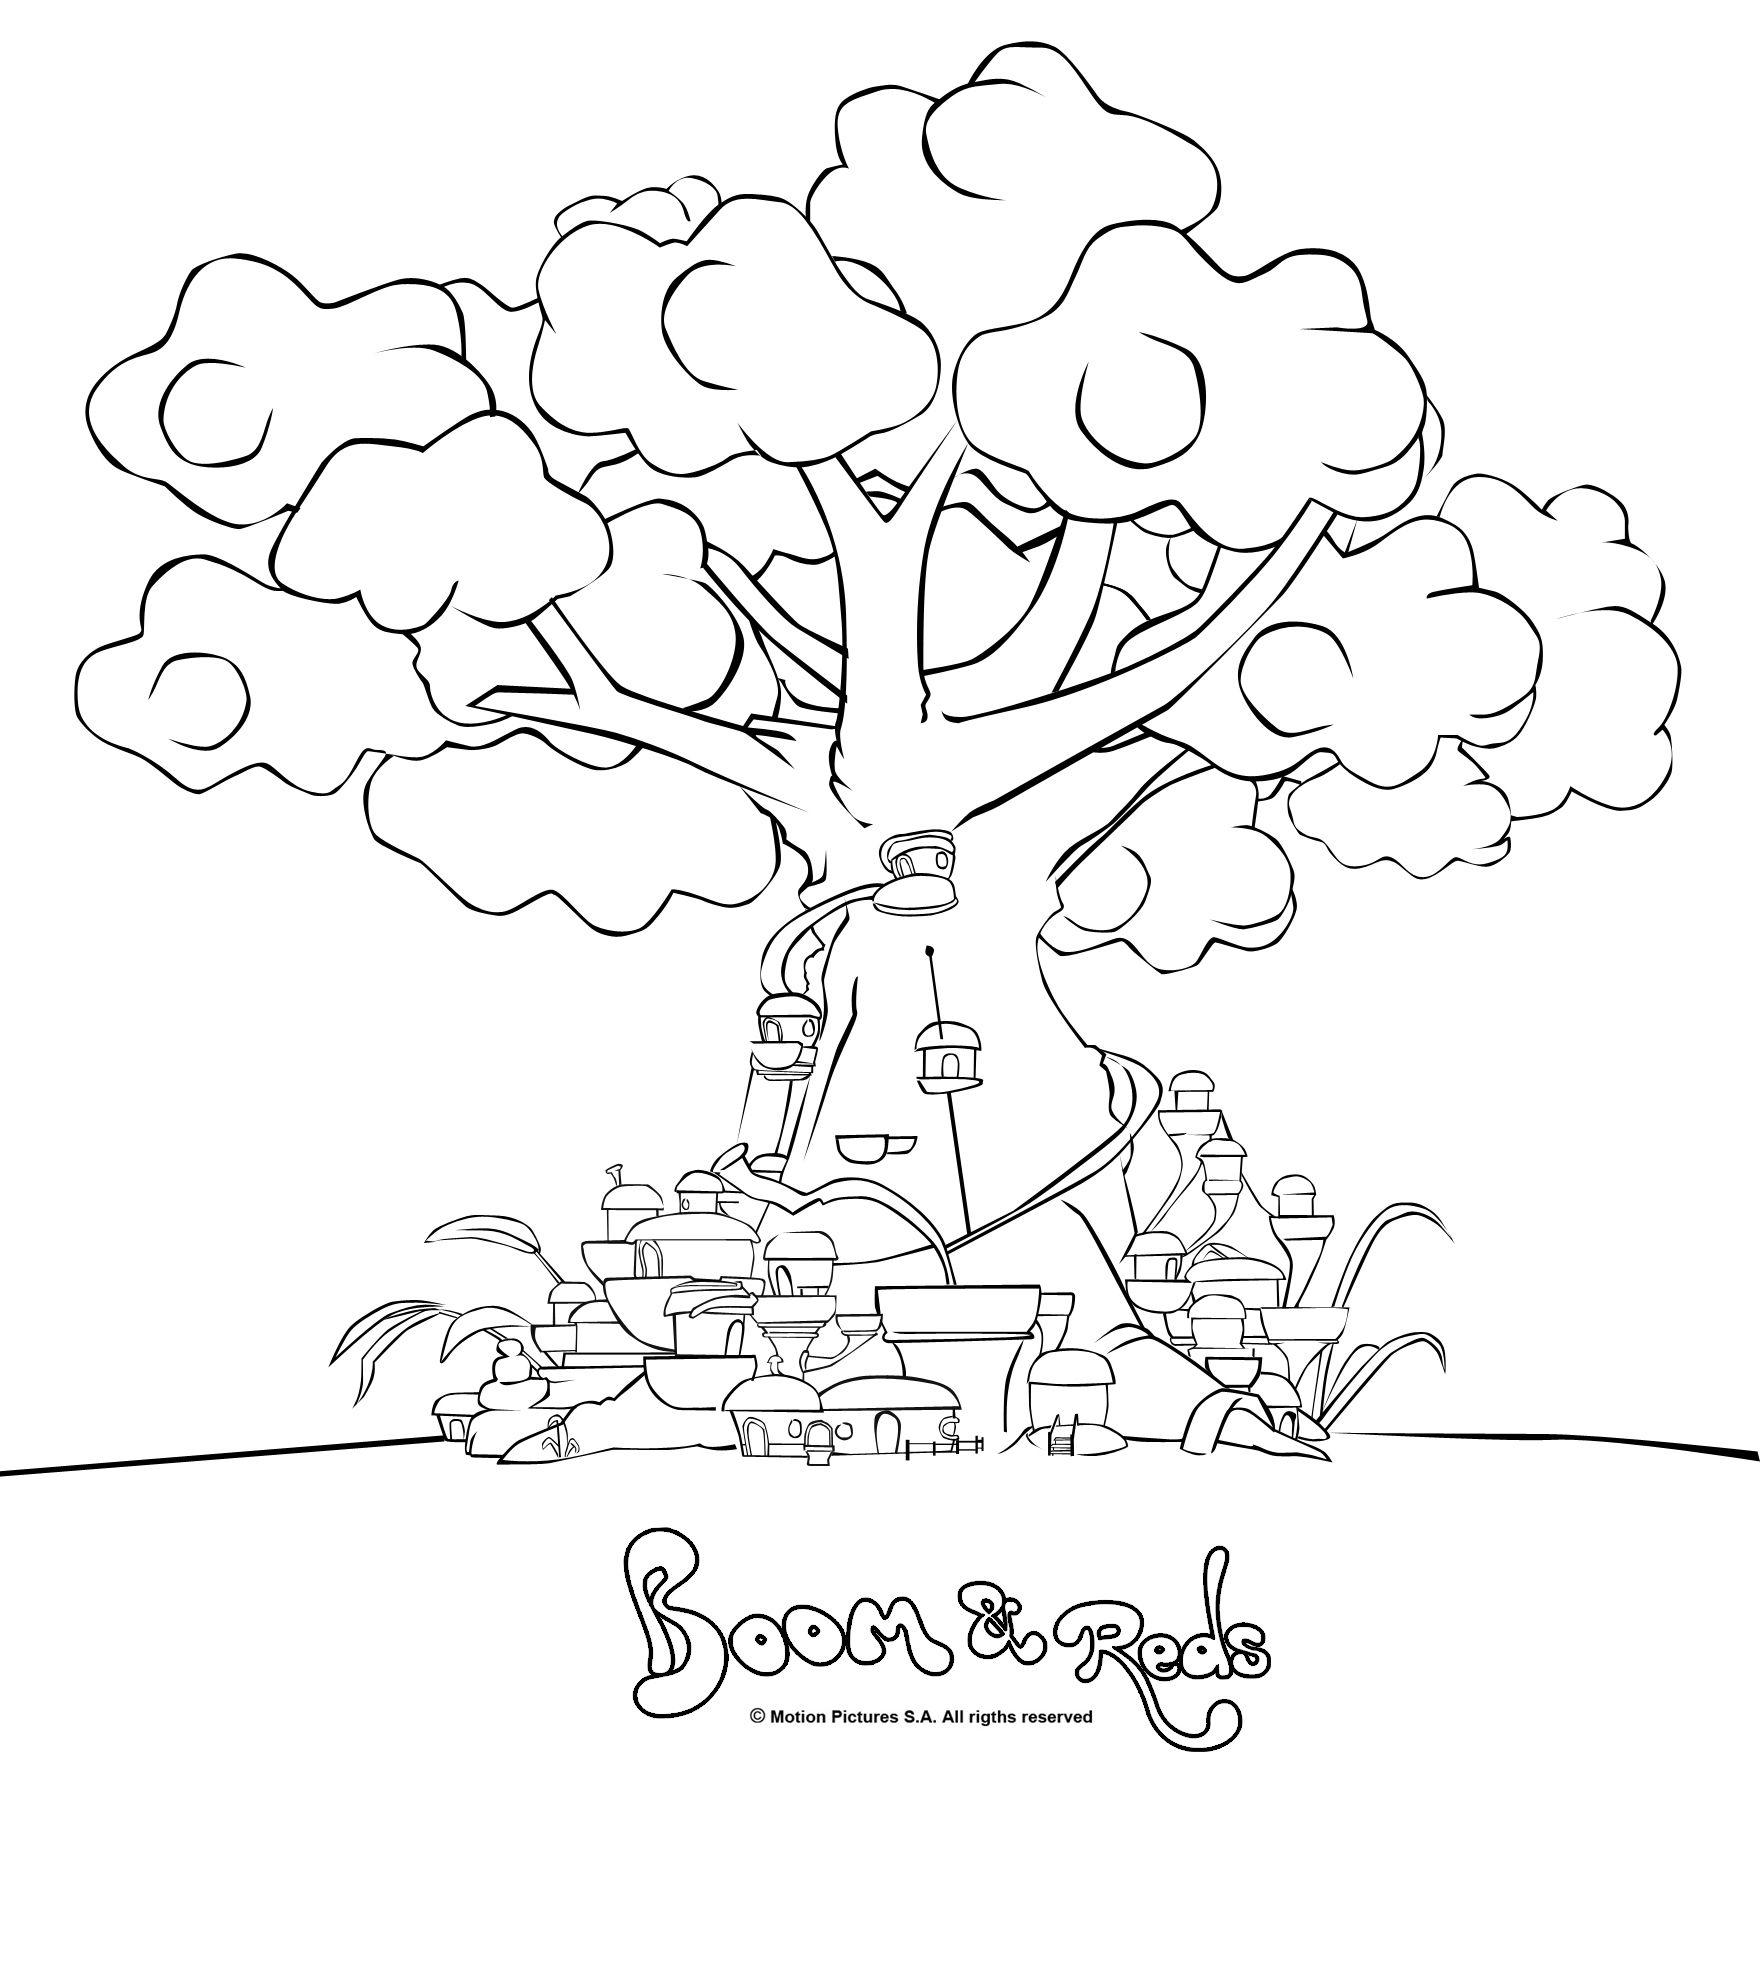 Pintas Boom & Reds, descargar dibujos colorear --- Boom Reds cartoon ...